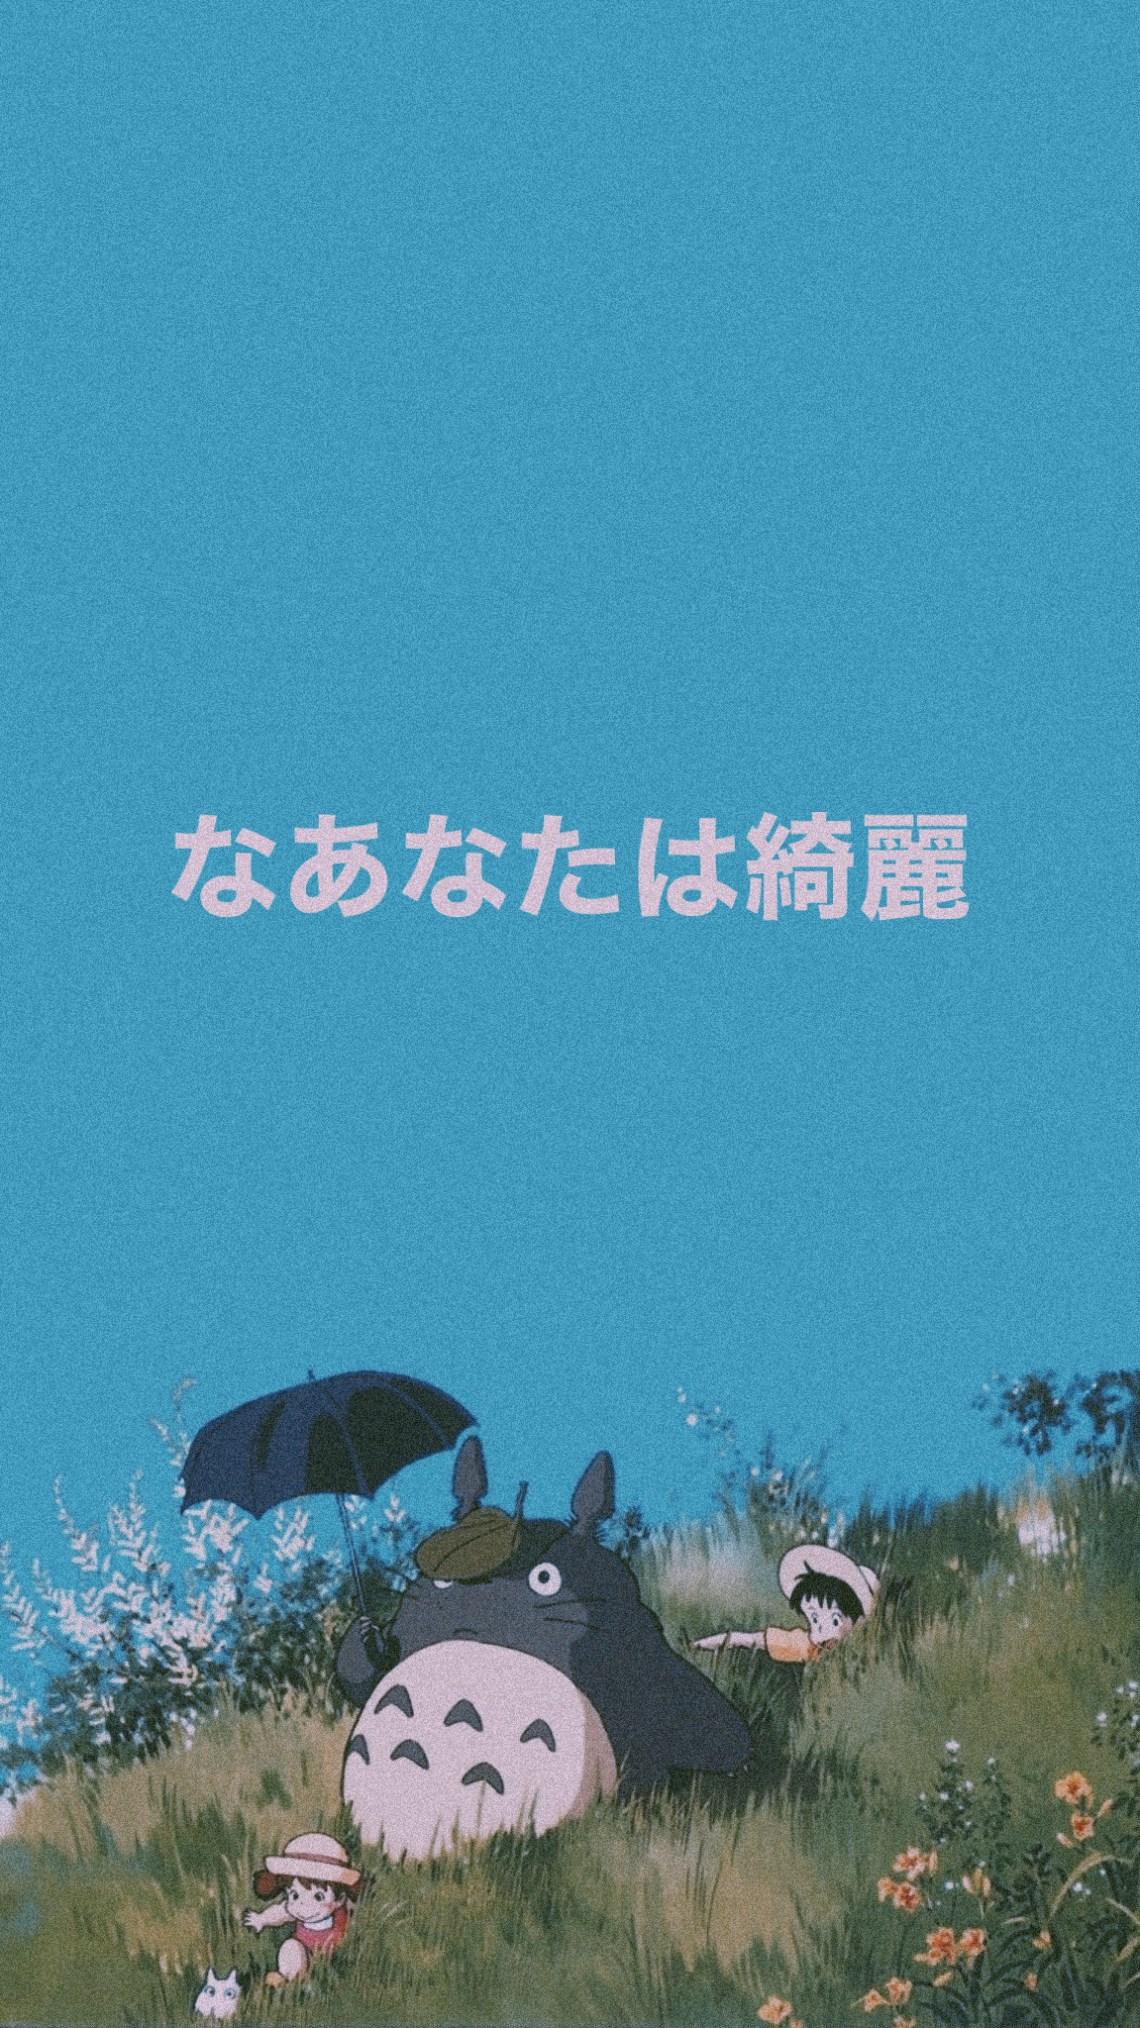 Aesthetic Wallpaper Iphone Totoro Image By Xbrazenx